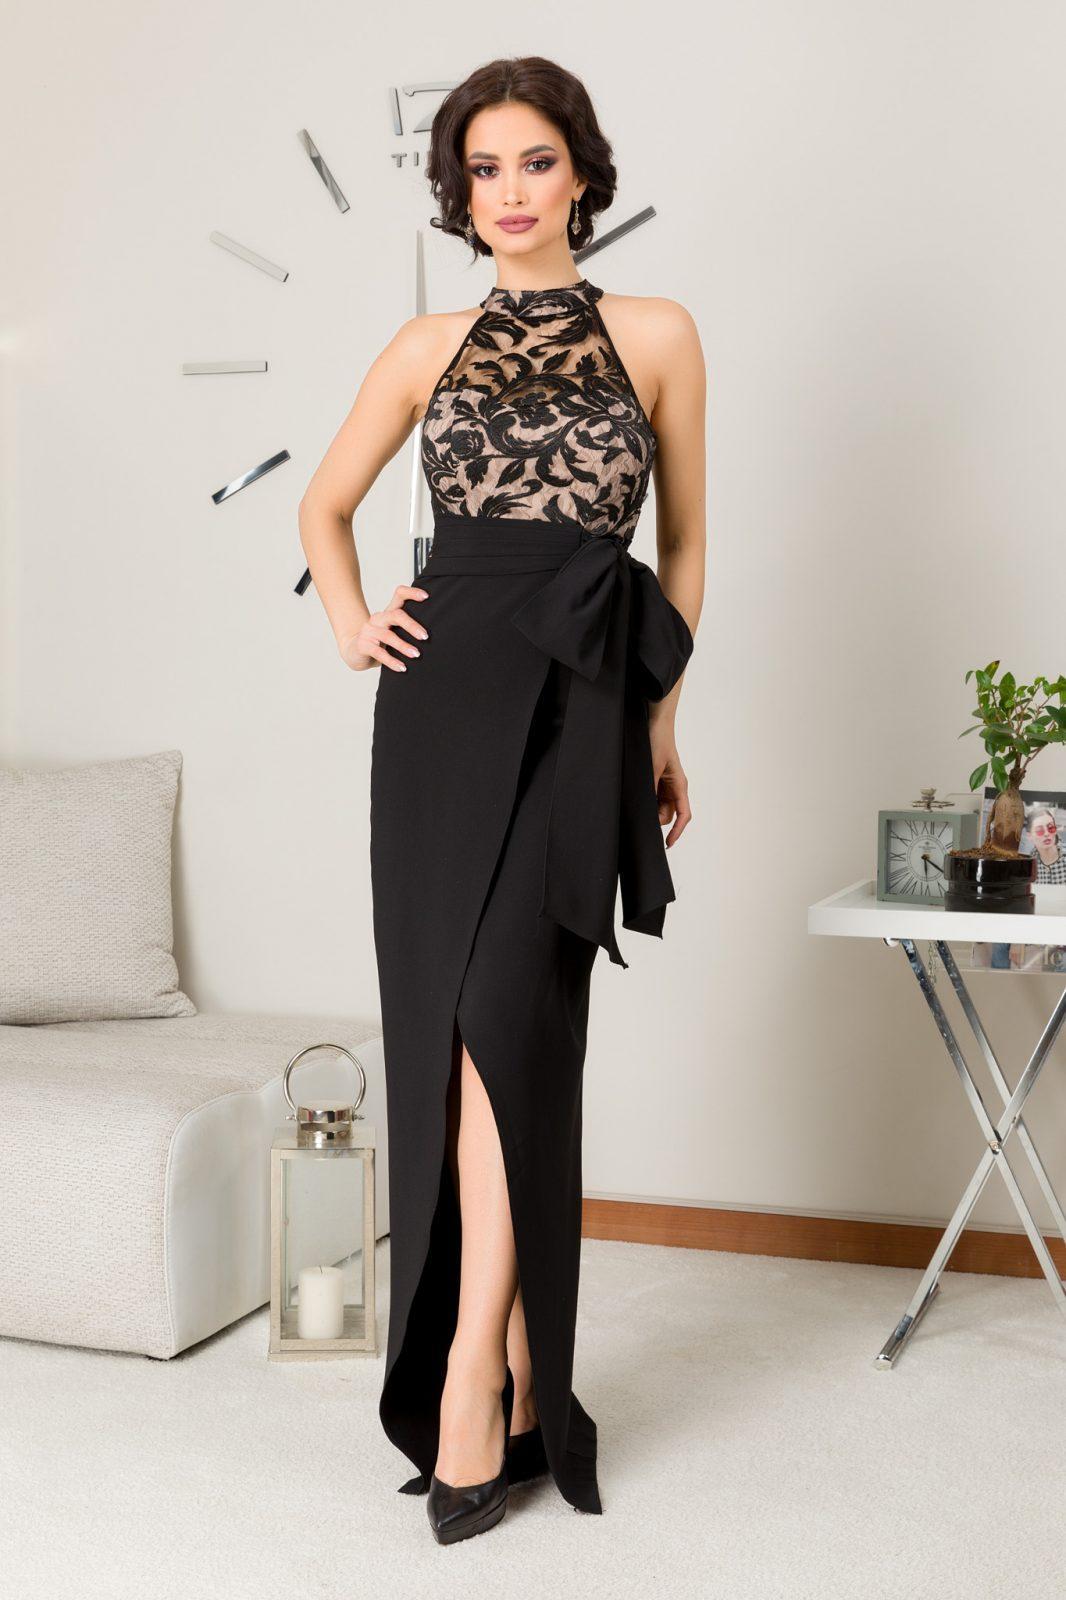 Spectacullar Black Dress